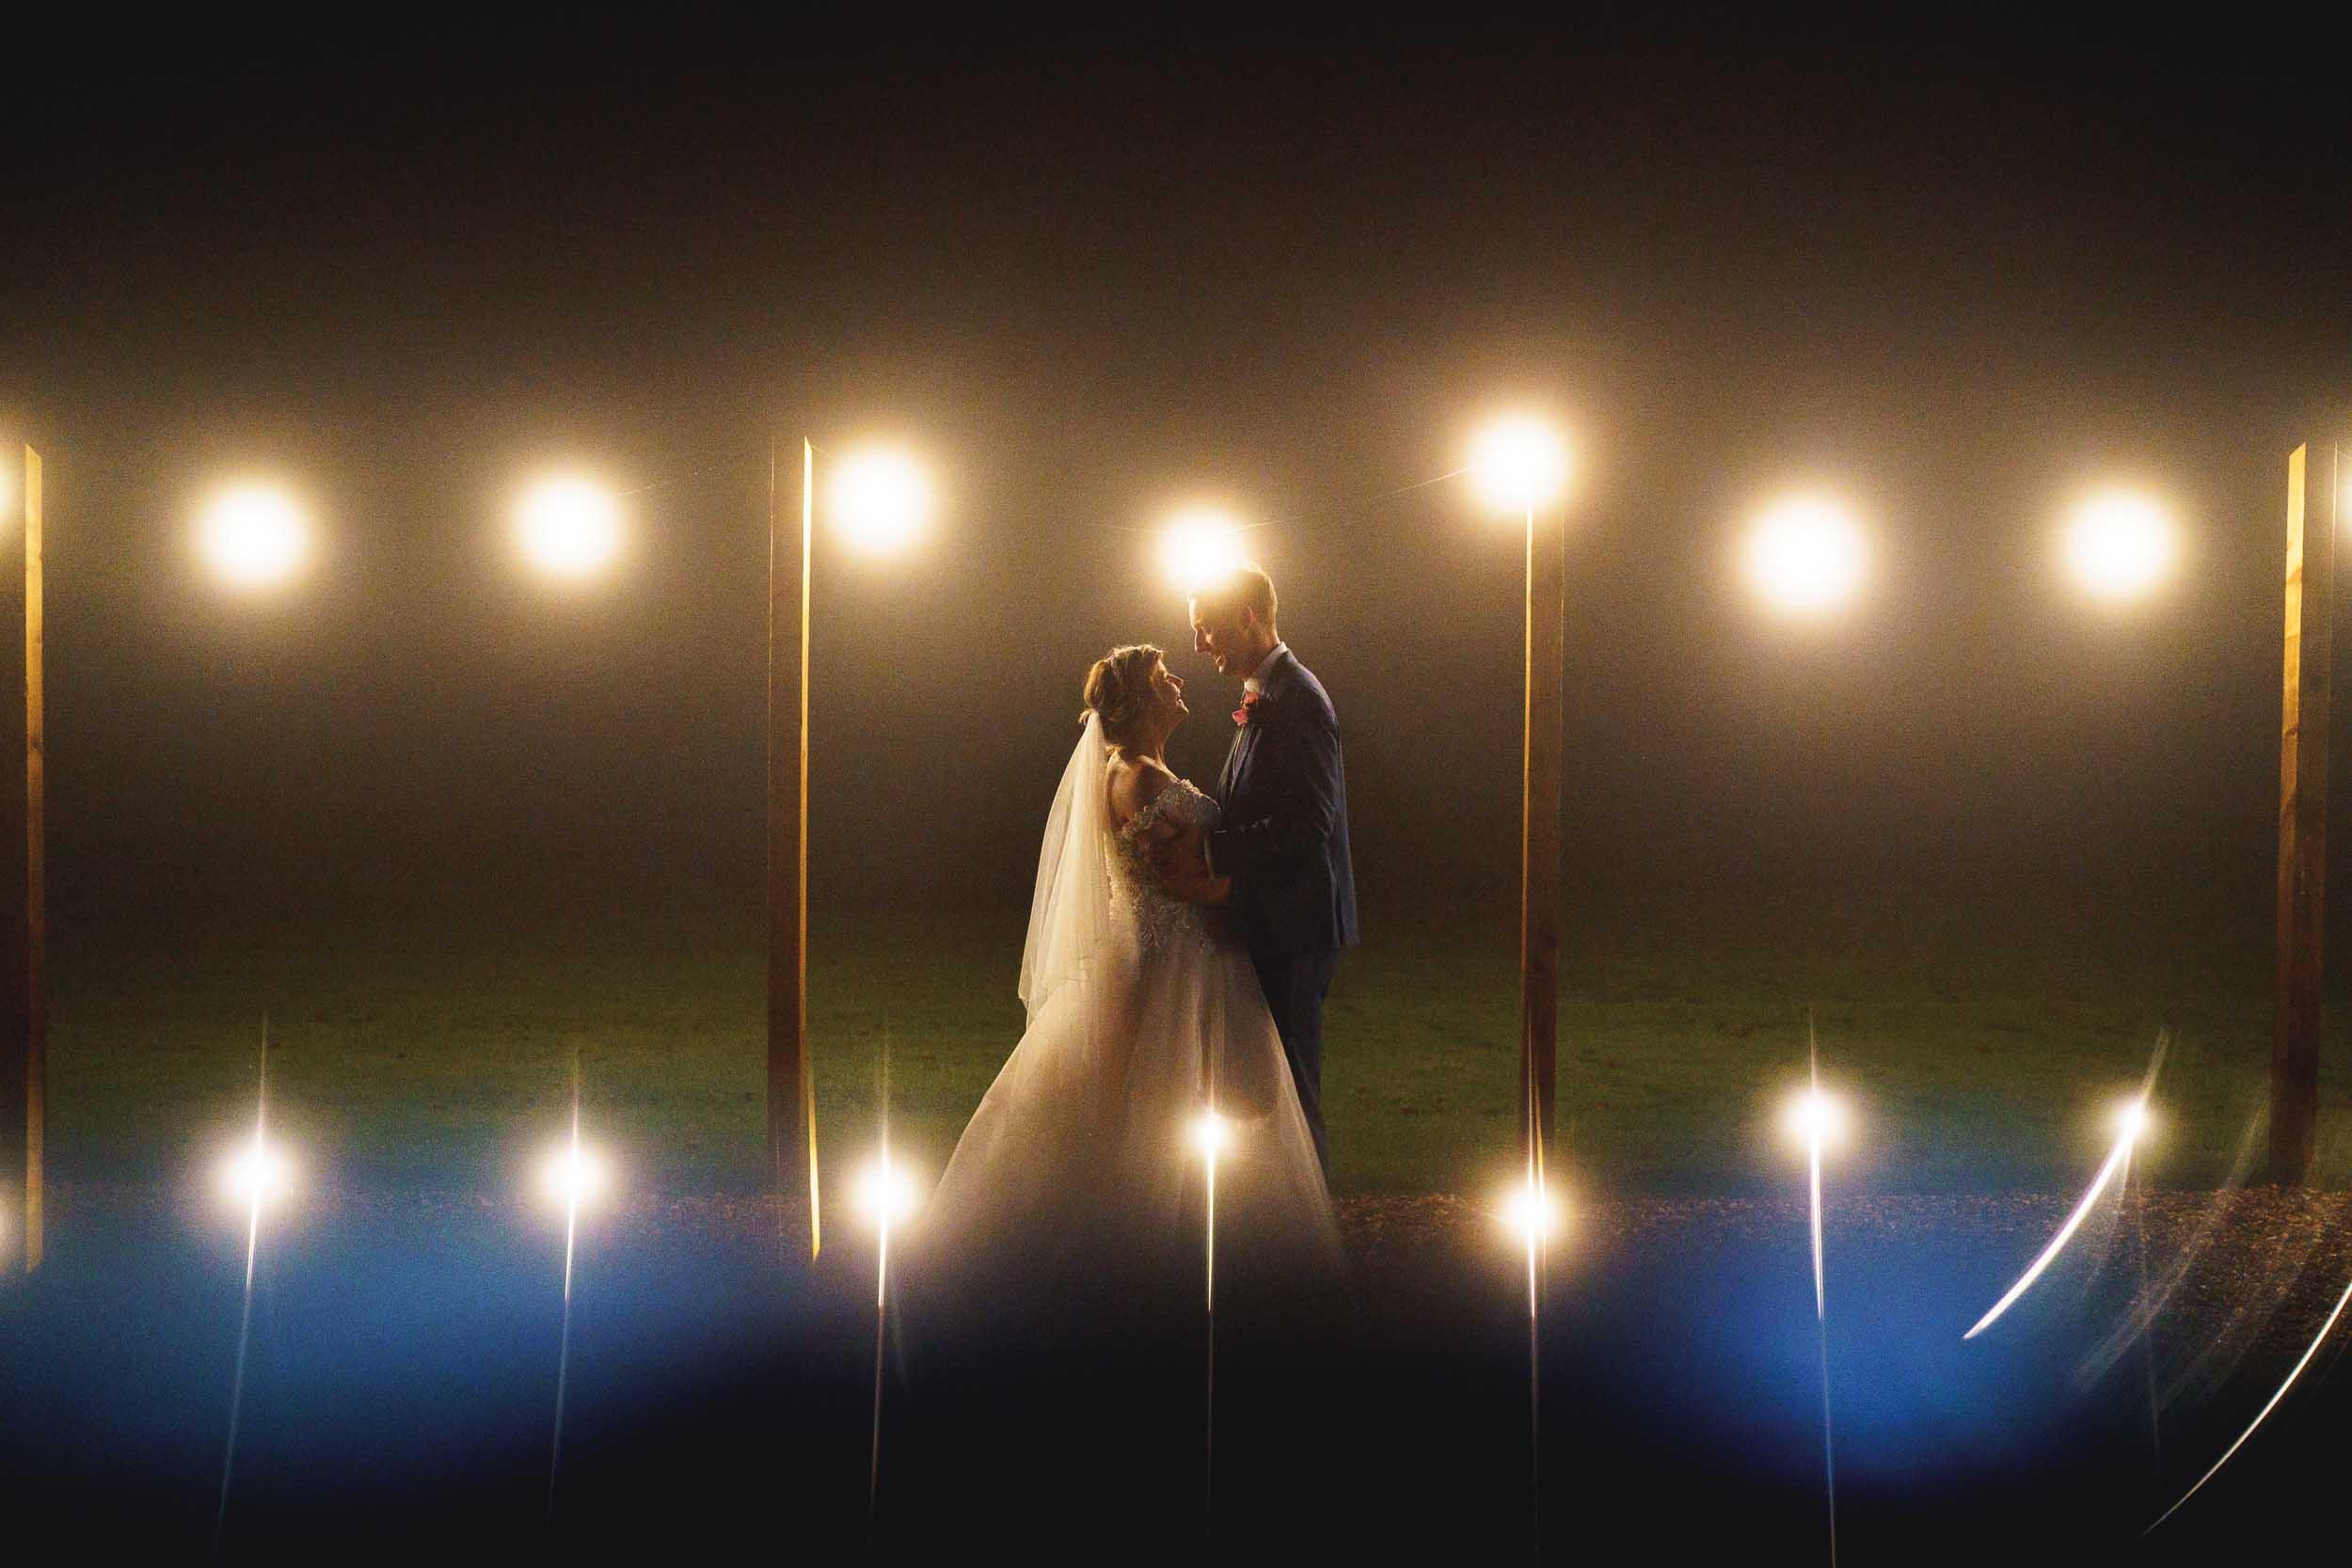 Bredenbury Court Barns Wedding Photography, Wedding Photography in Herefordshire, Bredenbury, Bromyard